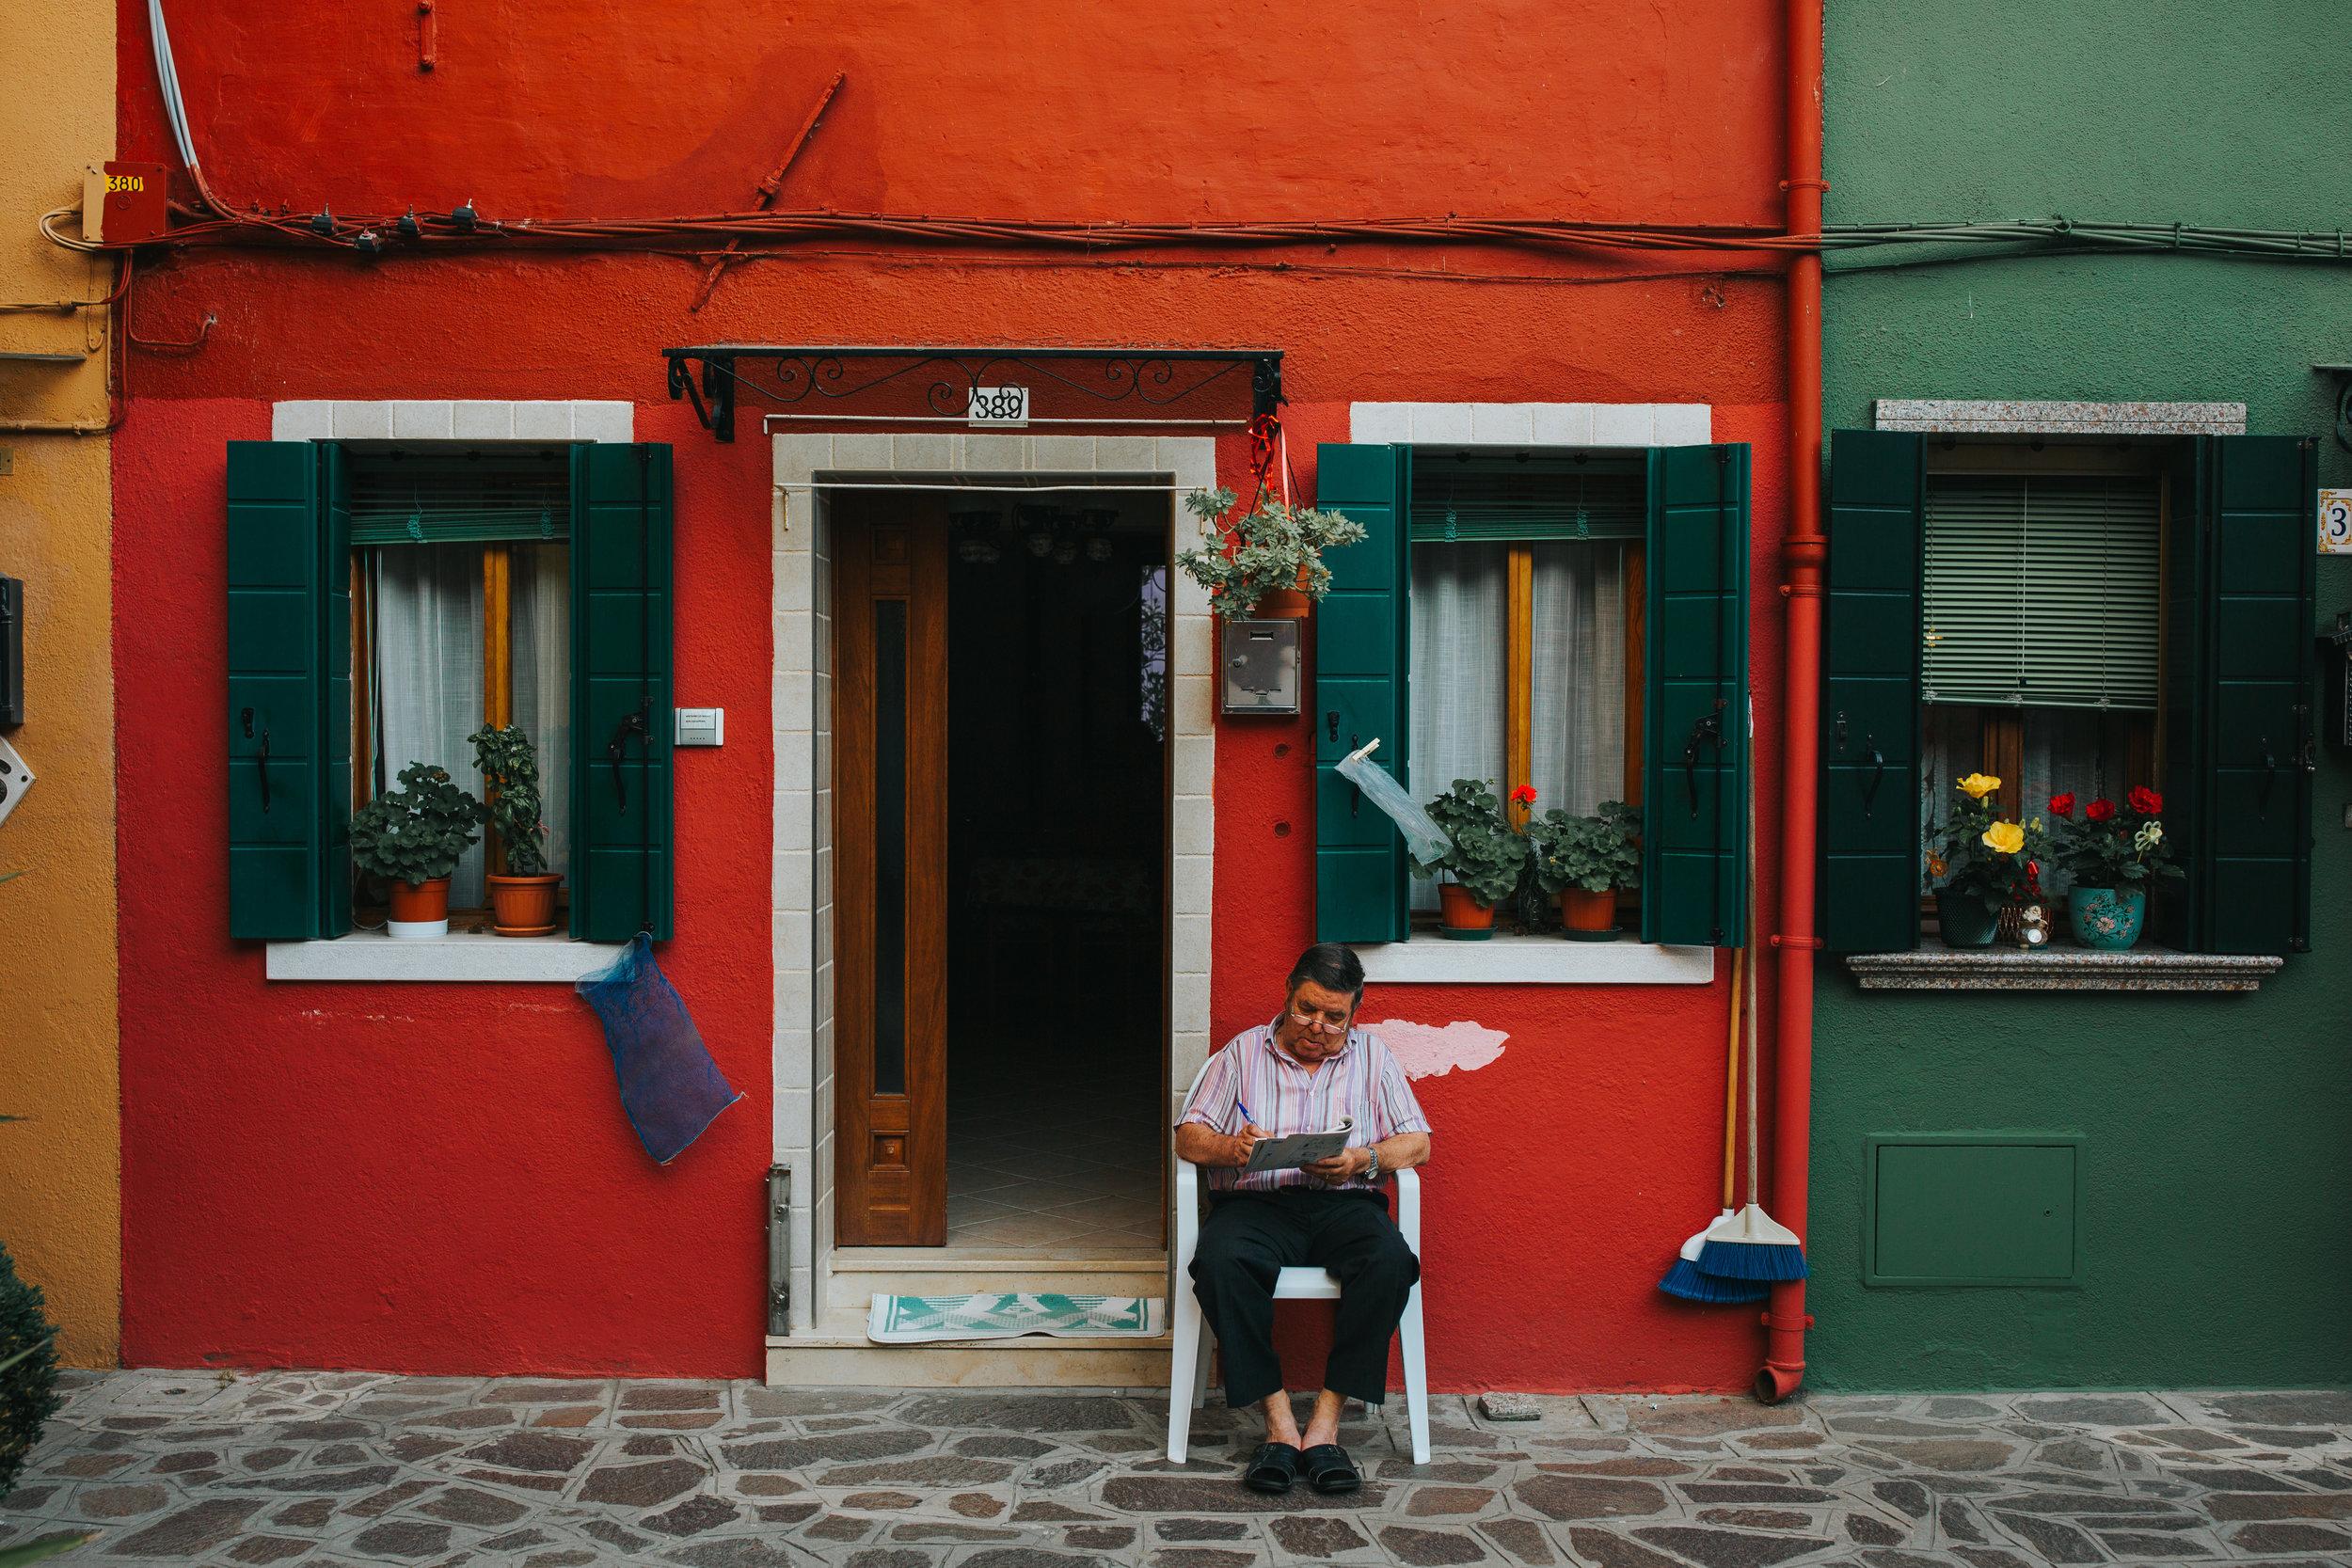 Is it worth visiting Burano